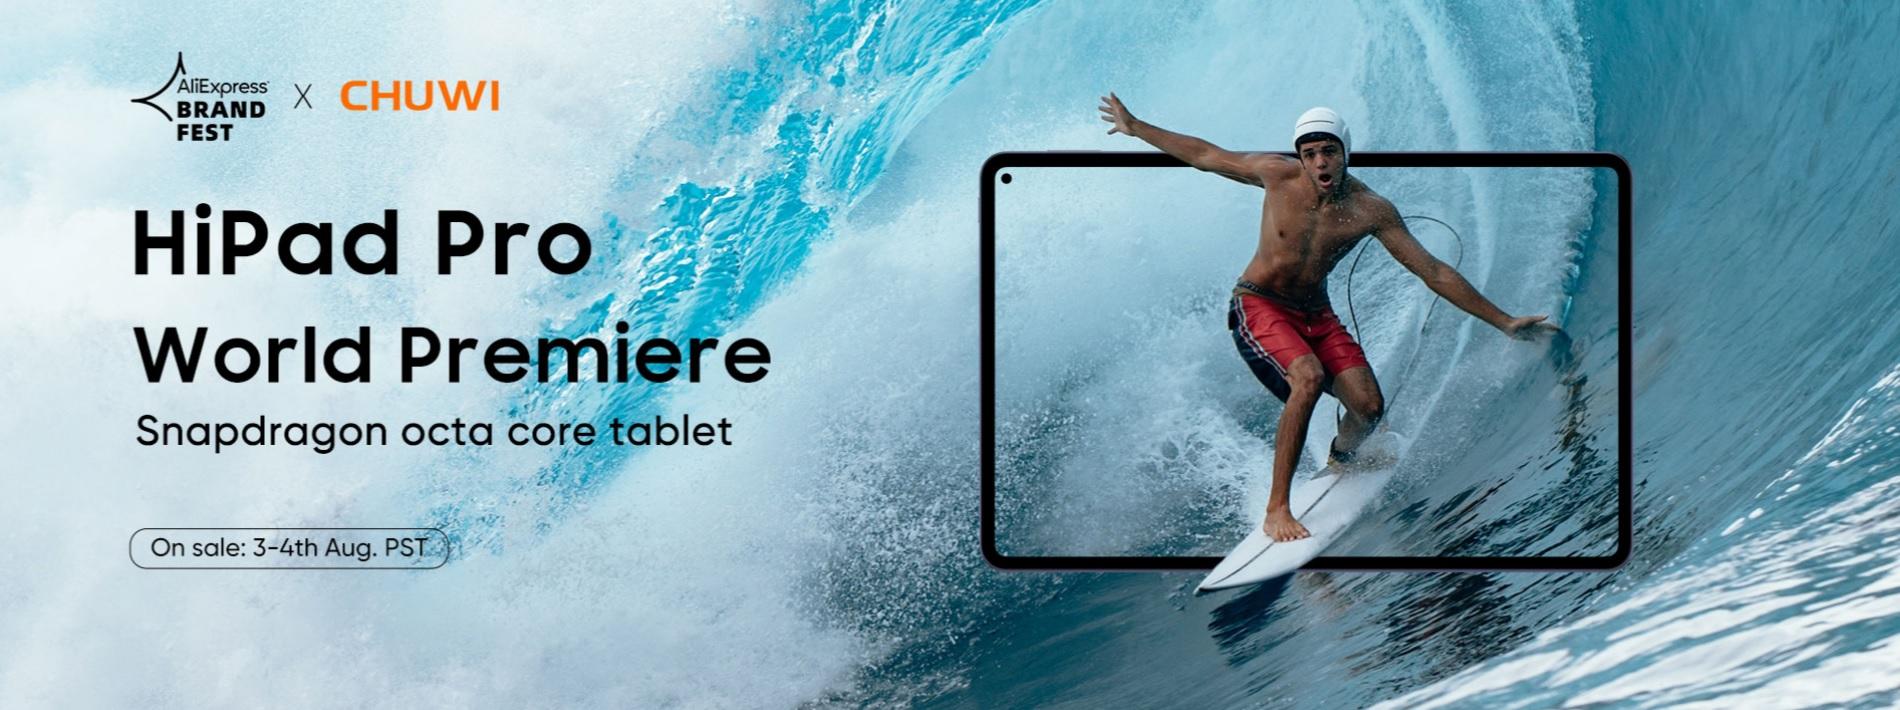 Chuwi HiPad Pro tablet world premiere